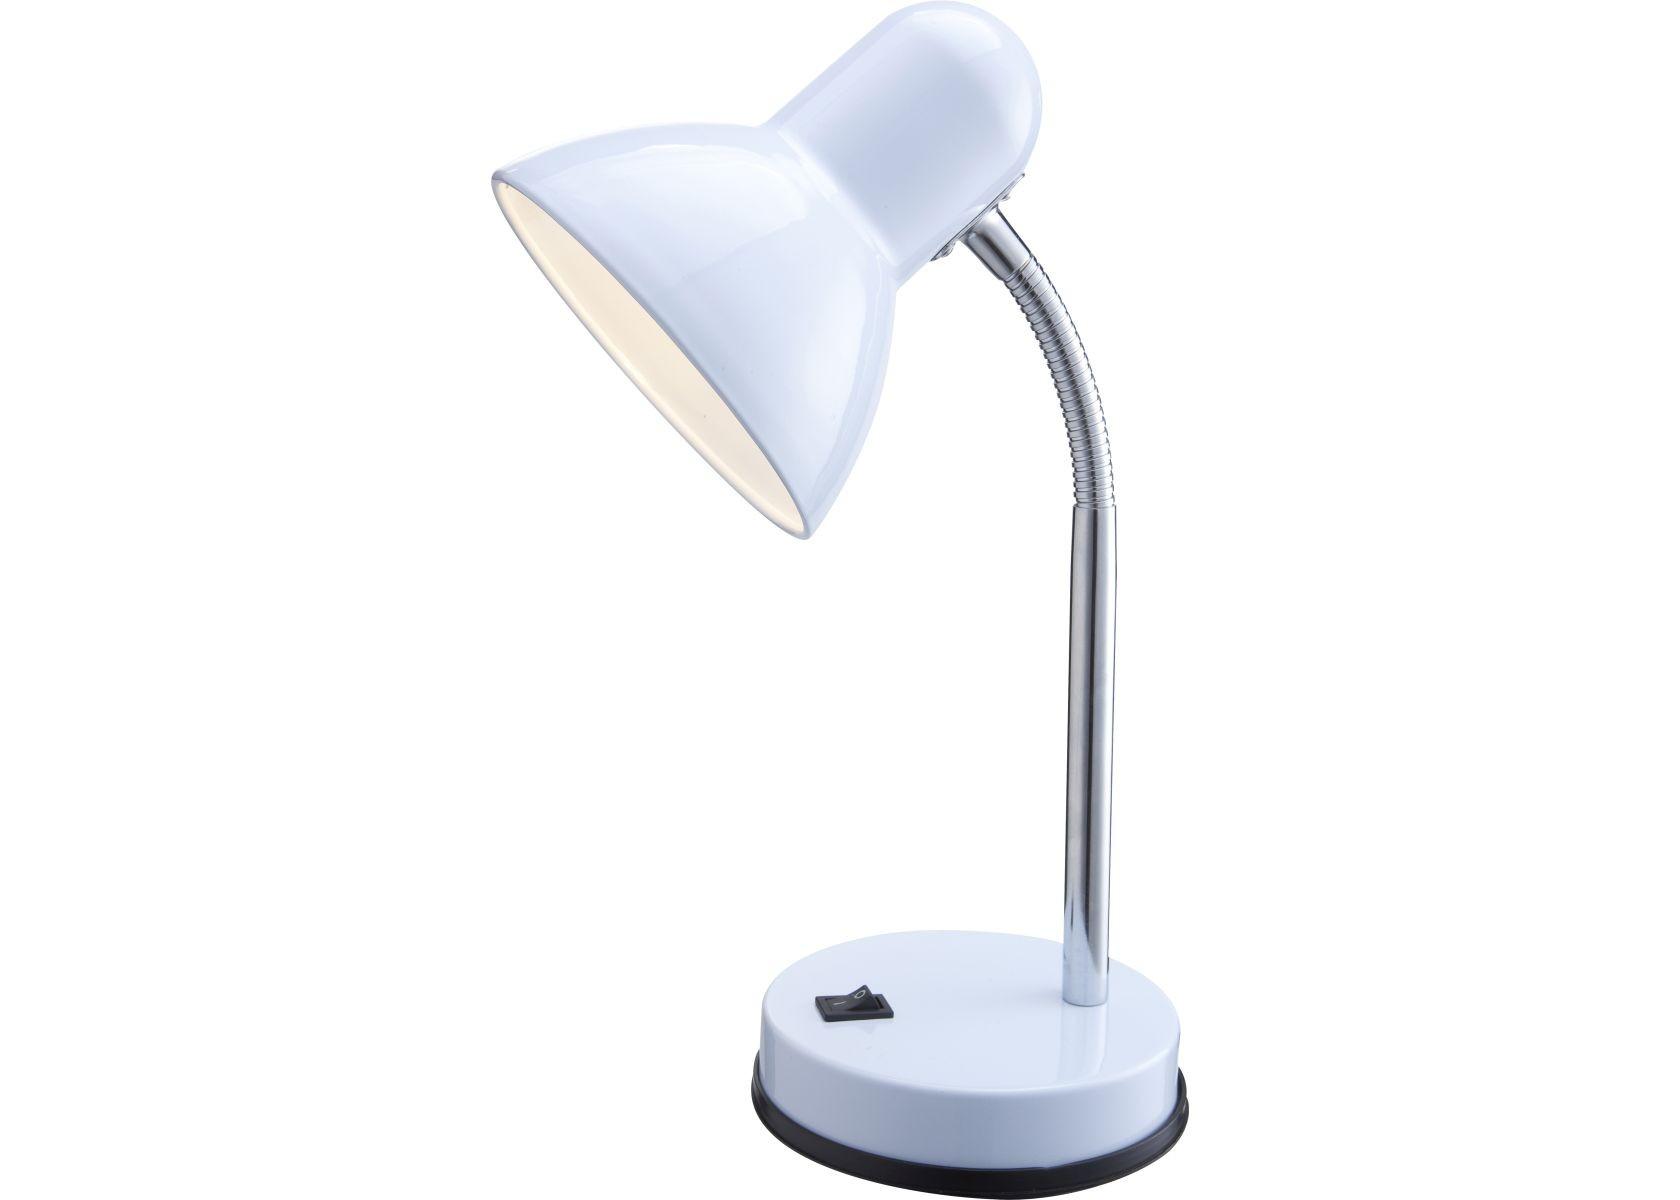 Настольная лампаНастольные лампы<br>&amp;lt;div&amp;gt;Вид цоколя: E27&amp;lt;/div&amp;gt;&amp;lt;div&amp;gt;Мощность: 40W&amp;lt;/div&amp;gt;&amp;lt;div&amp;gt;Количество ламп: 1&amp;lt;/div&amp;gt;<br><br>Material: Пластик<br>Высота см: 34